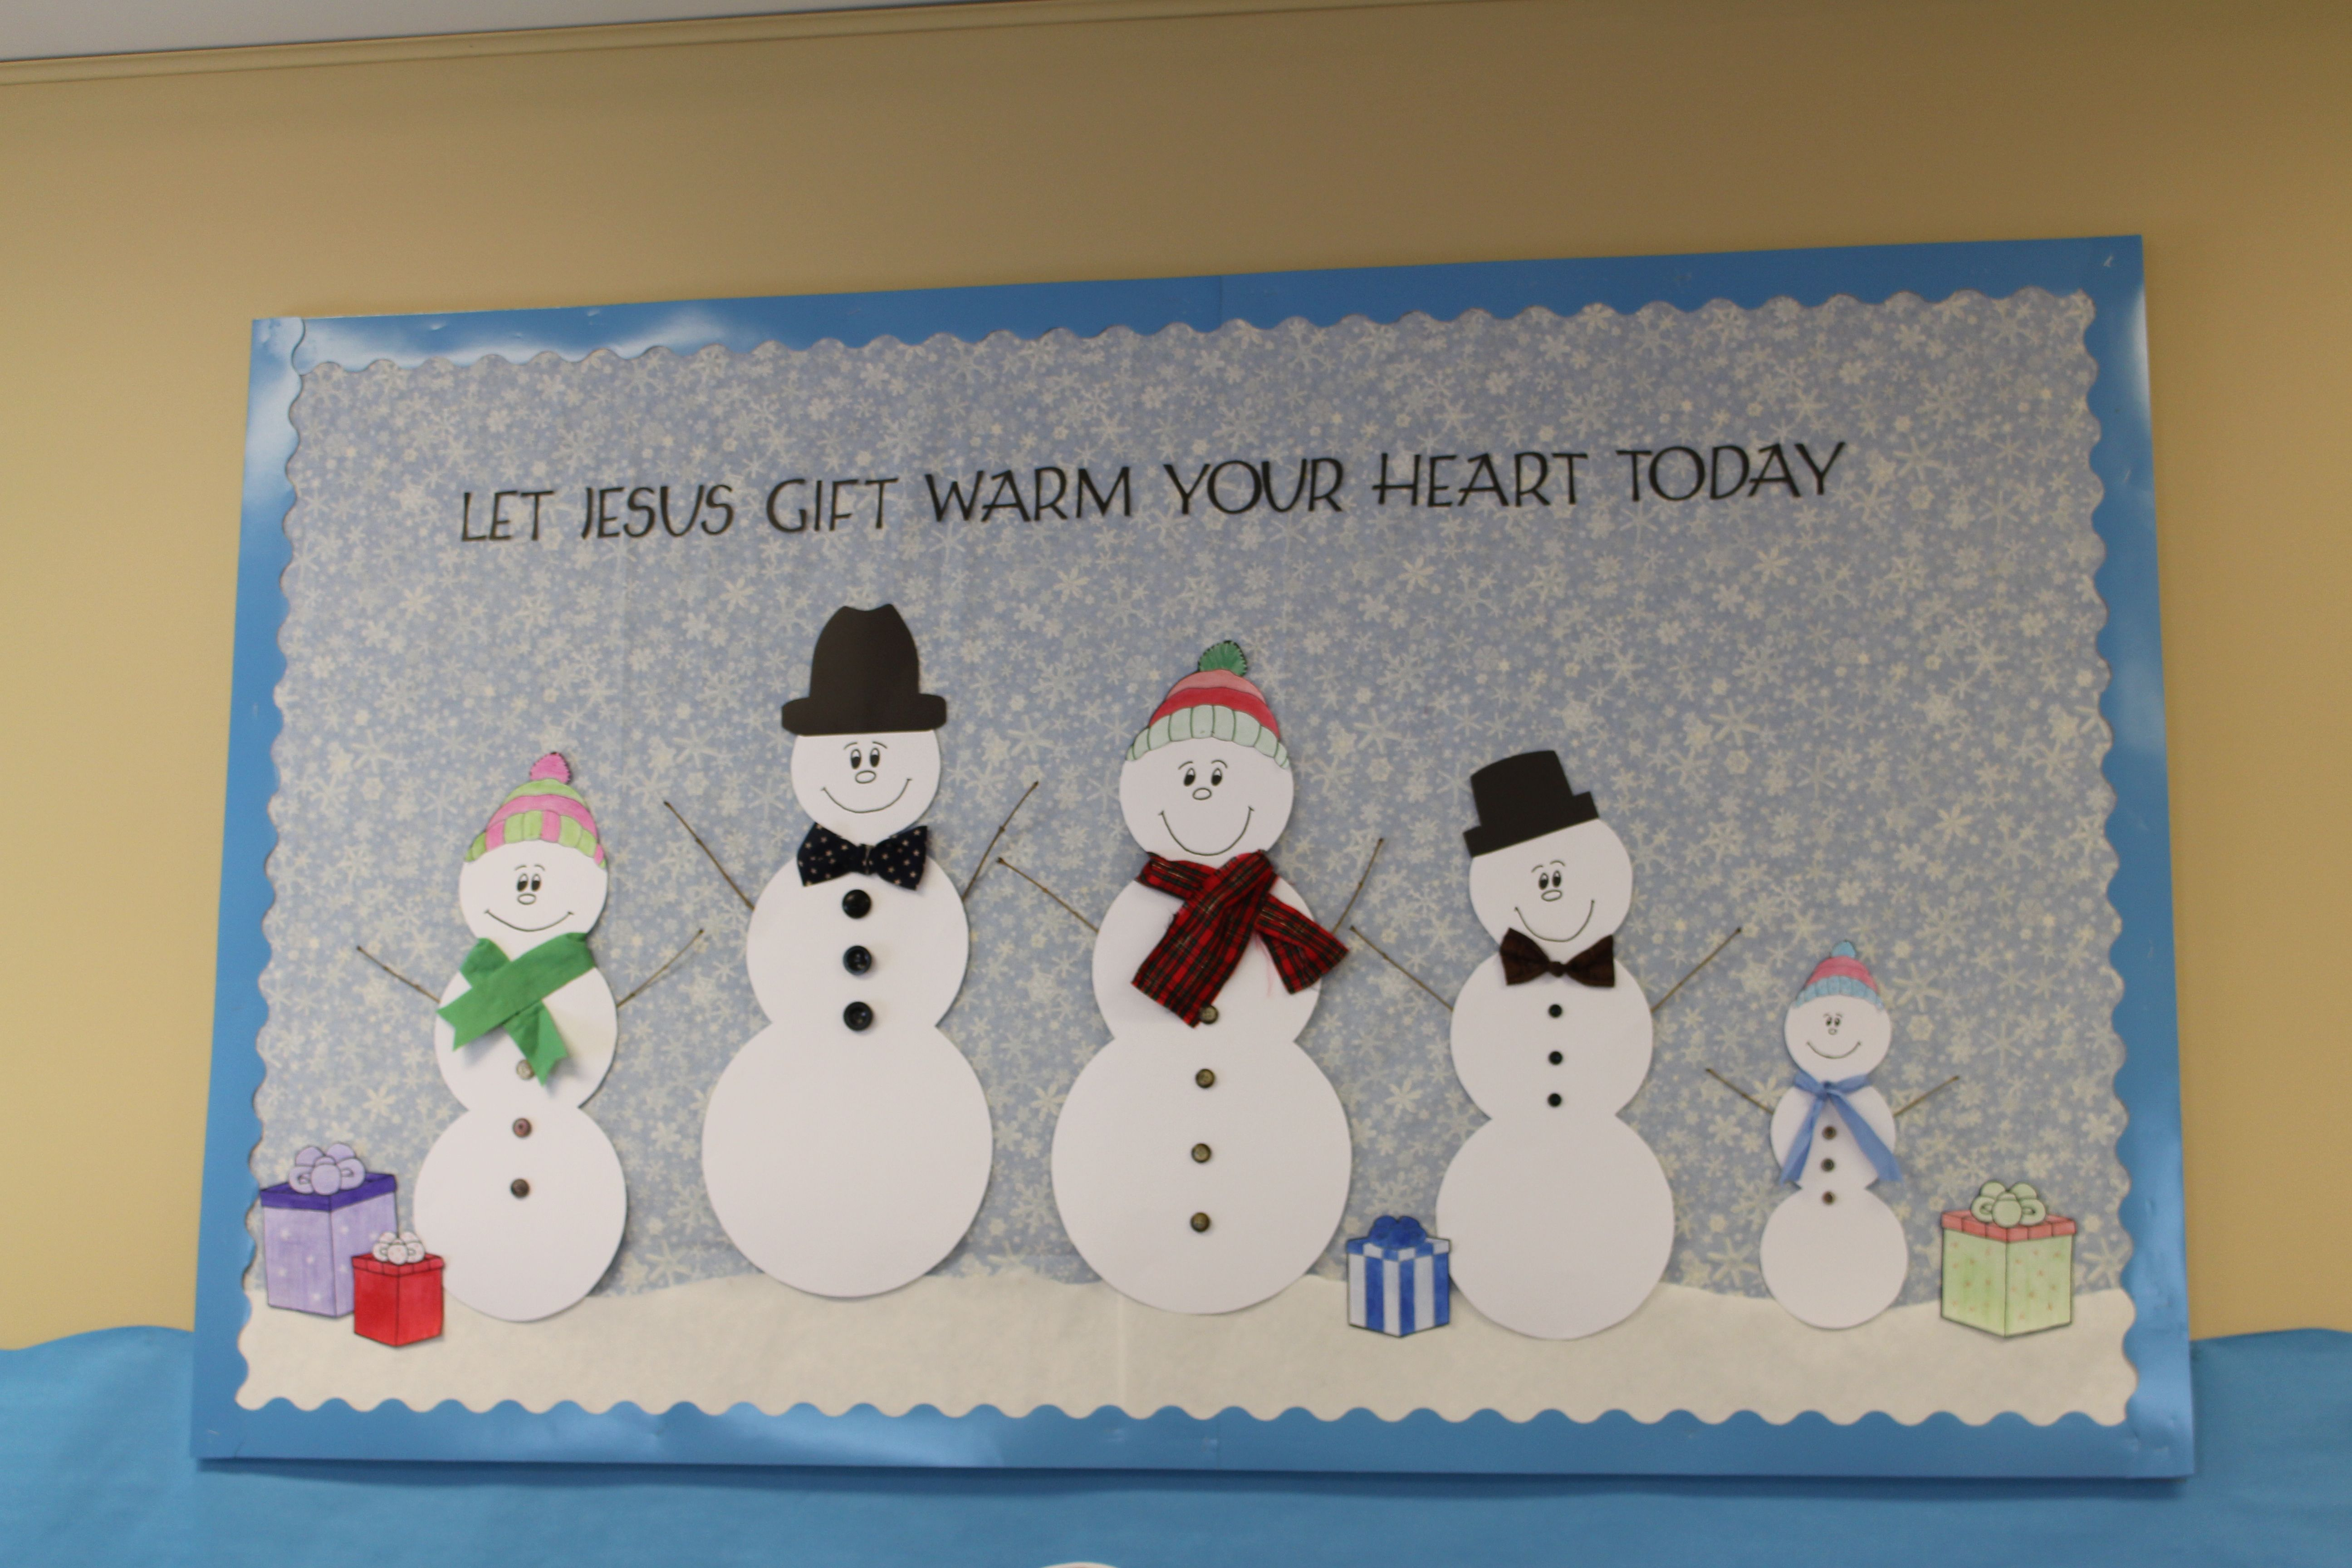 Christian Winter Snowman School Bulletin Board Idea Let Jesus Gift Warm Your Heart Today Credits T Teacher Boards Gifts